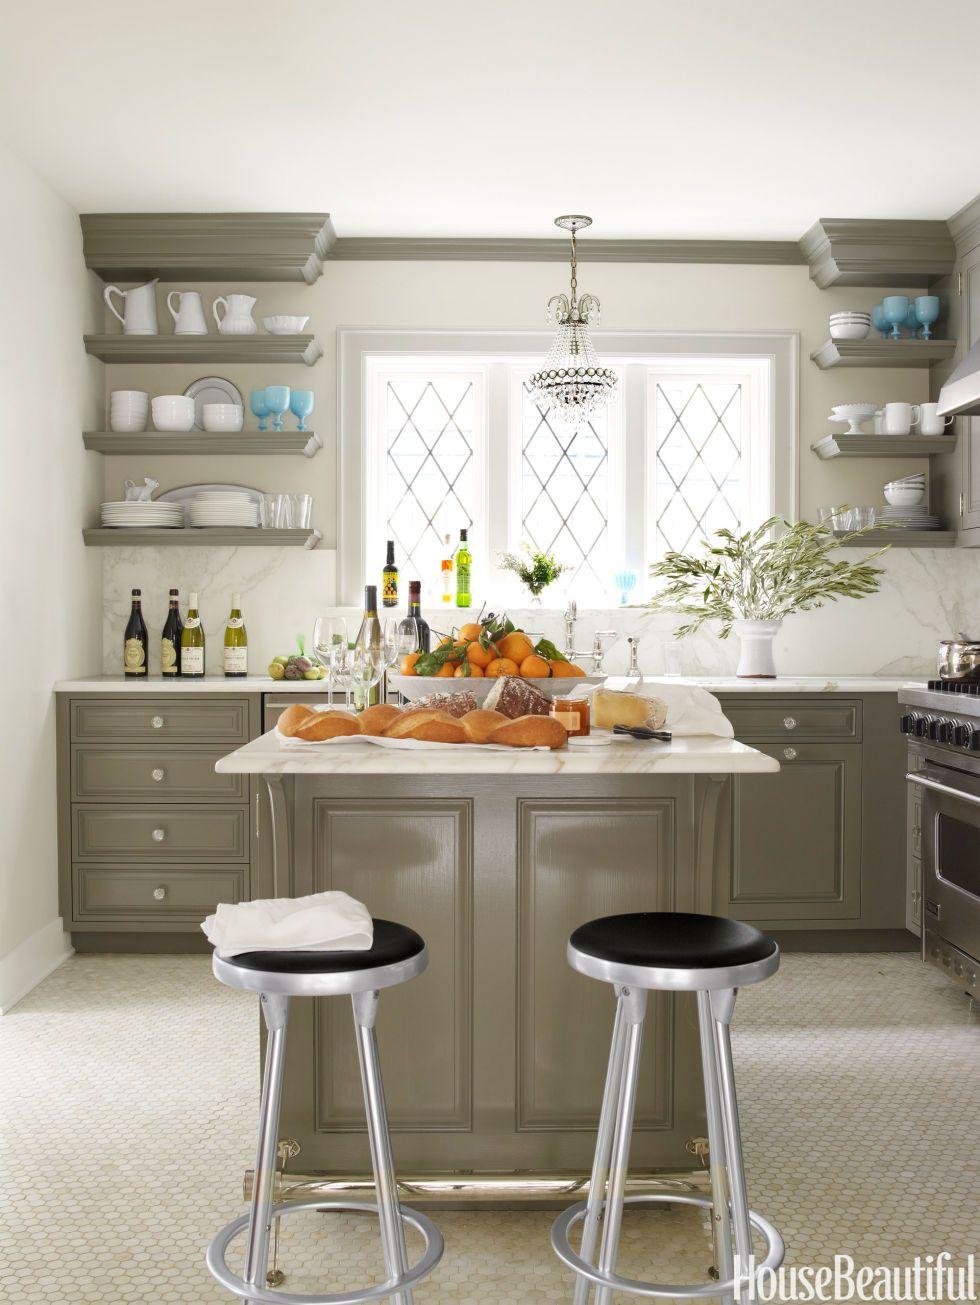 30 dreamy kitchen paint colors and ideas | popular kitchen colors